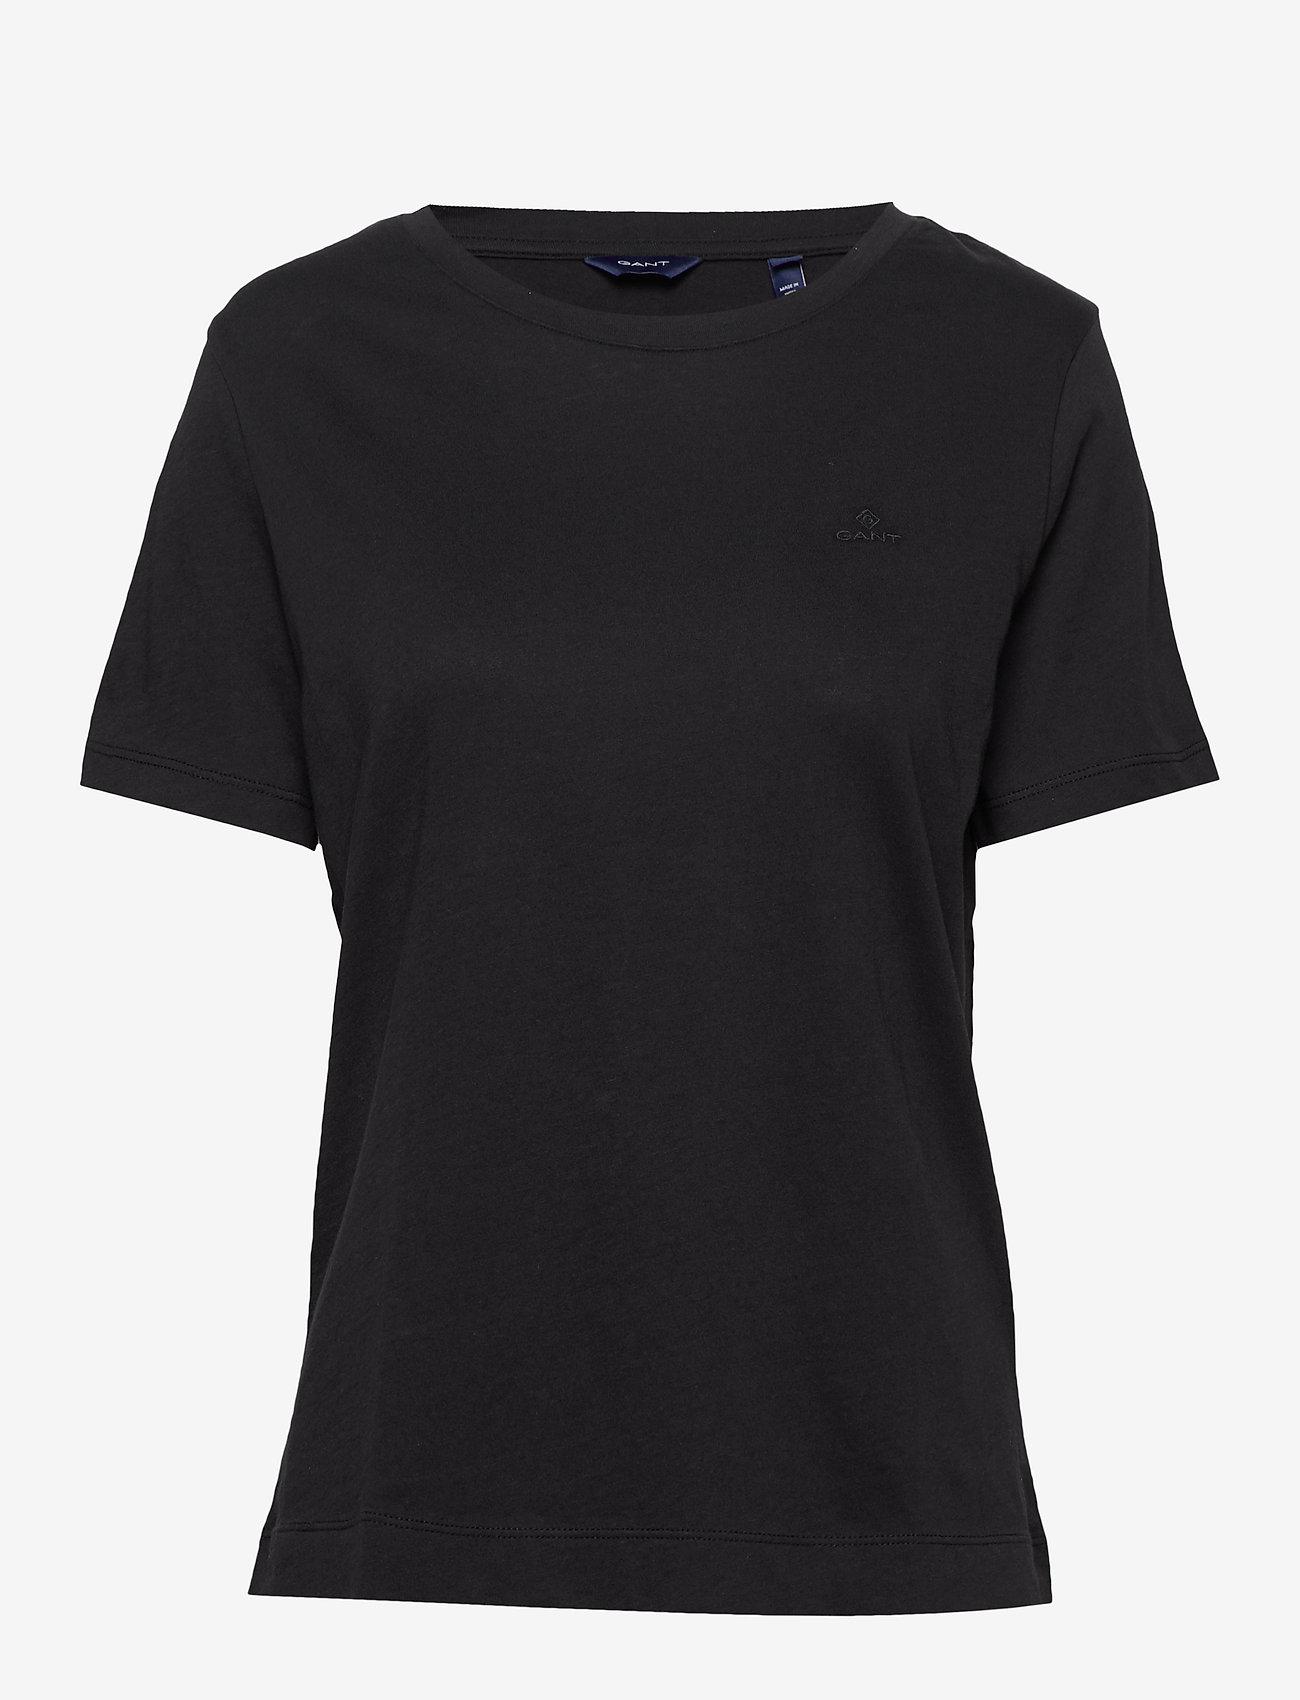 GANT - ORIGINAL SS T-SHIRT - t-shirts - black - 0